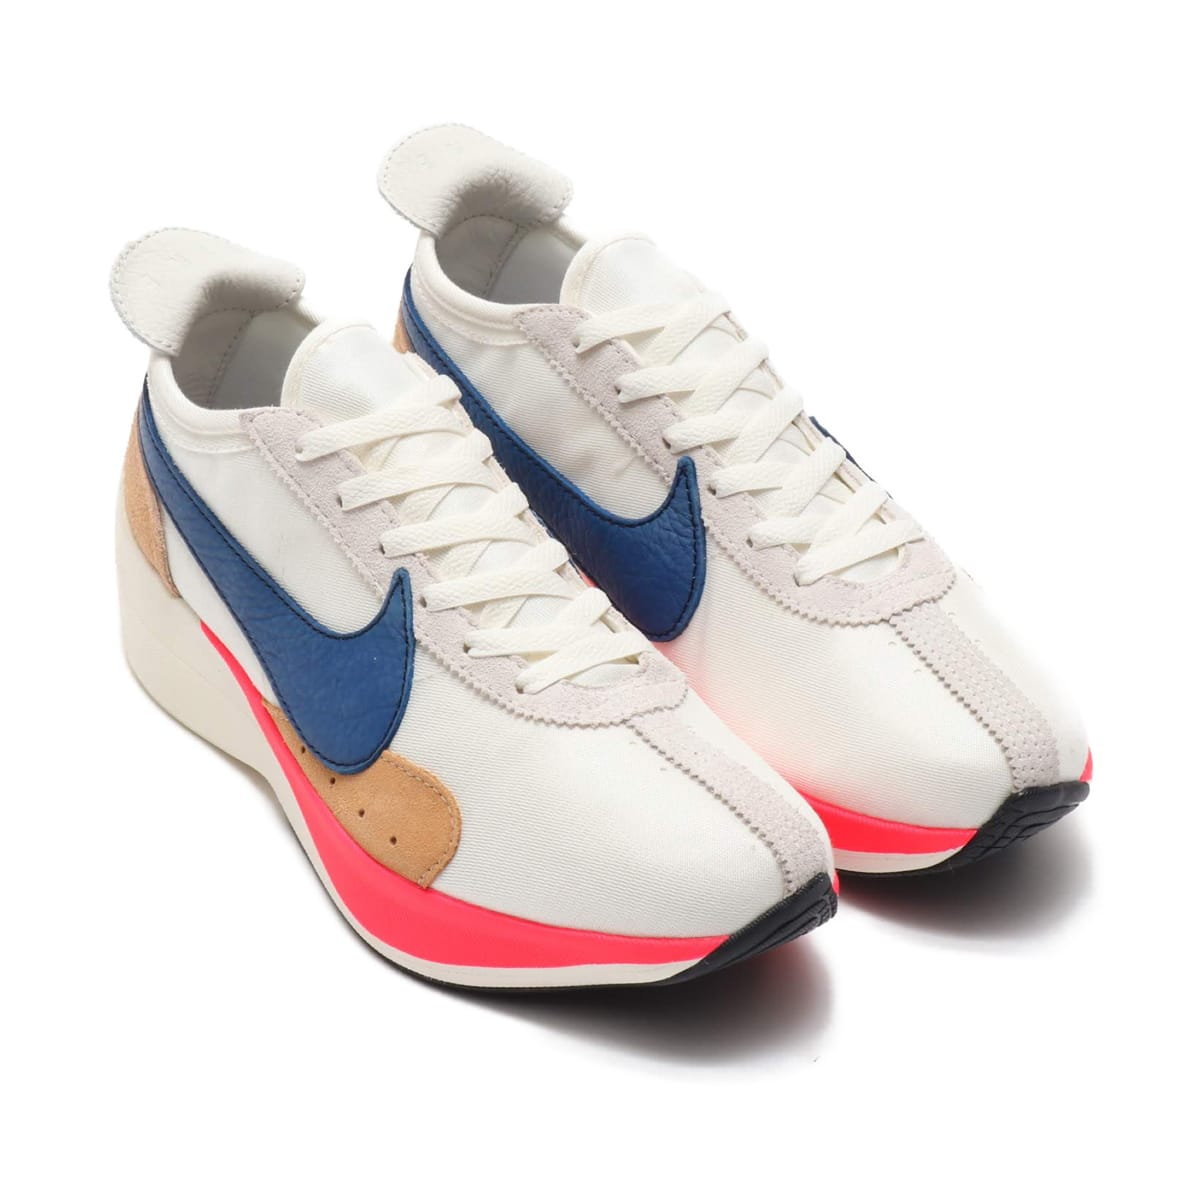 Nike Moon Racer QS Sail, Gym Blue & Red | END.